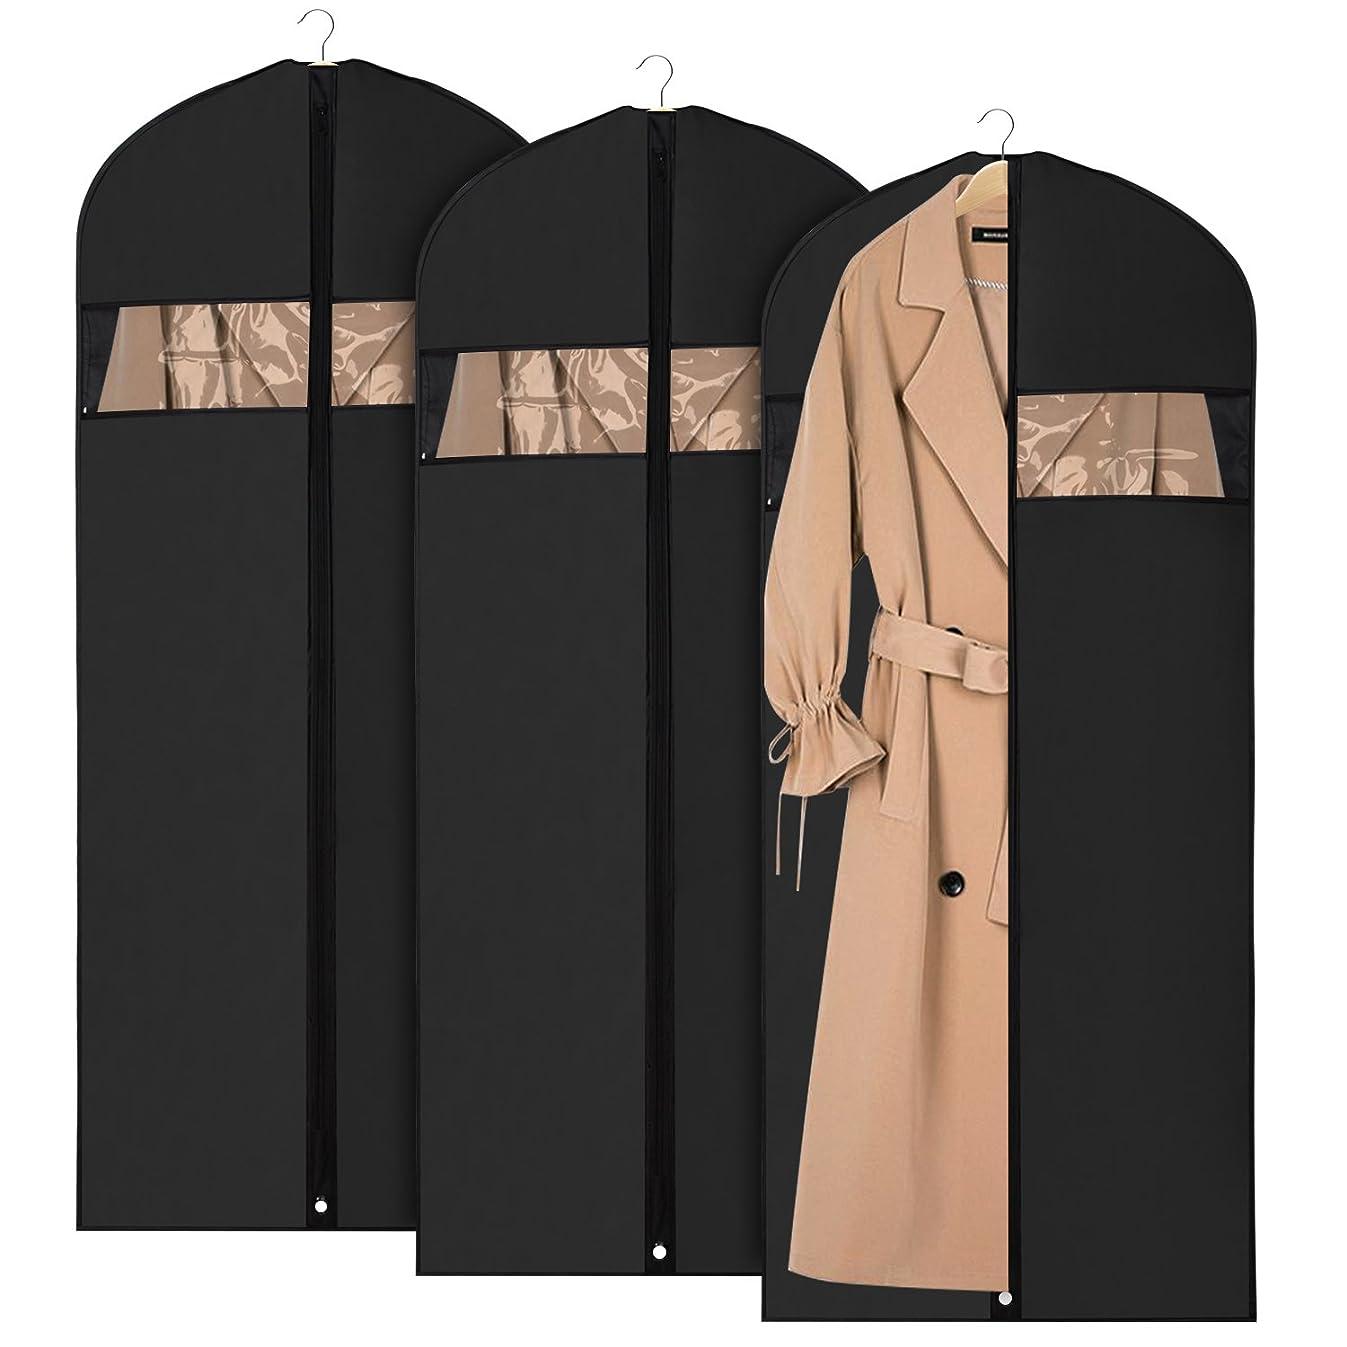 Univivi Garment Bag Suit Bag for Storage and Travel 60 inch, Washable Suit Cover for Dresses, Suits, Coats, Set of 3